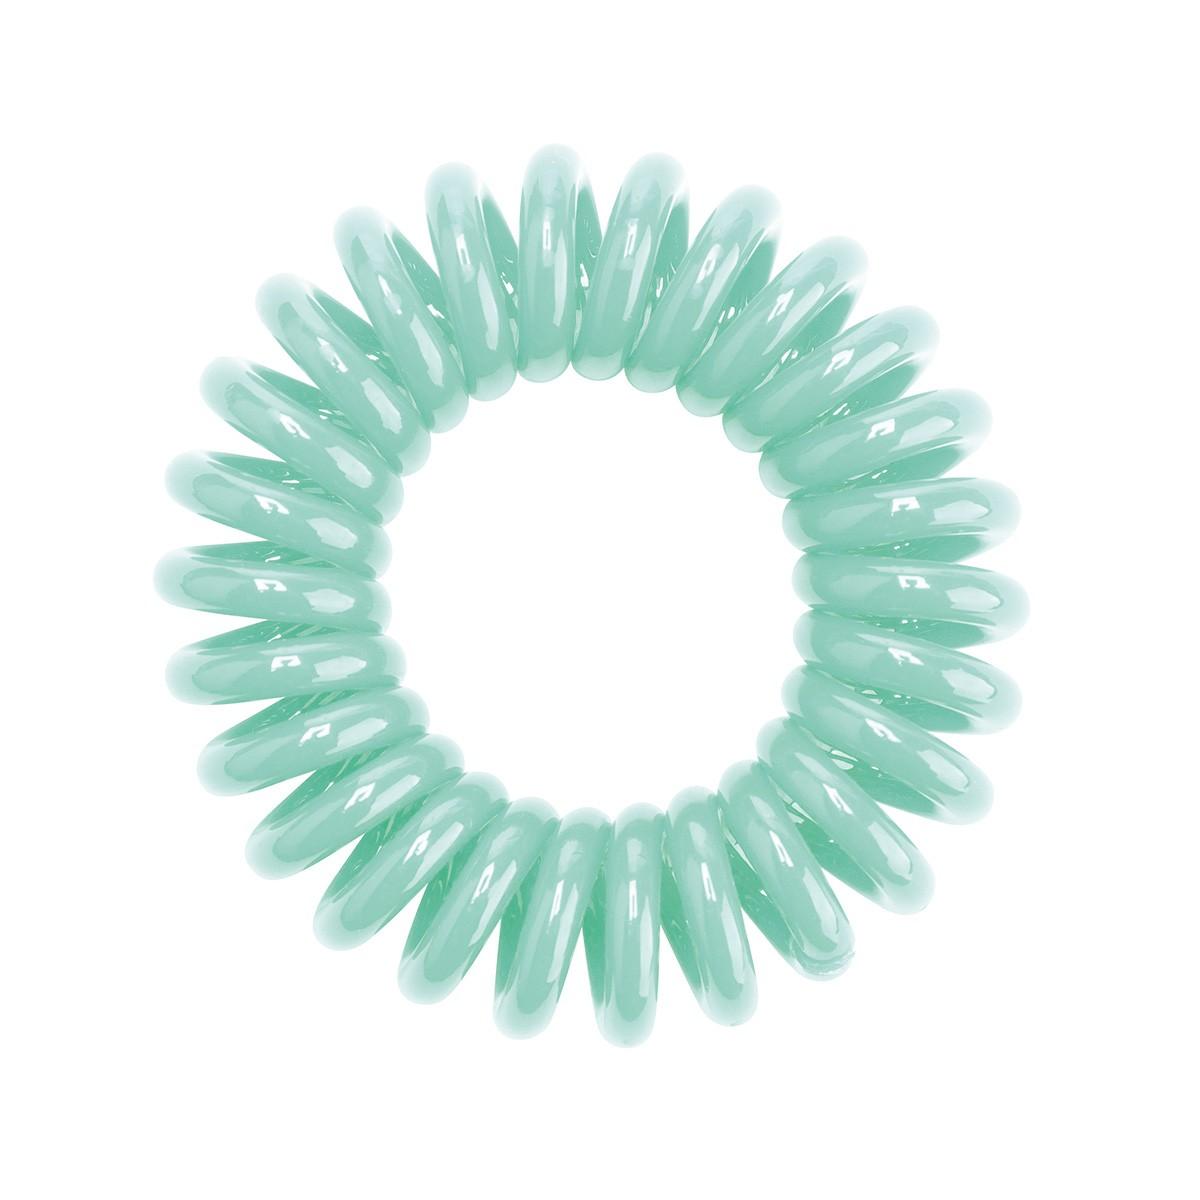 HH SIMONSEN Hair Cuddles Turquoise - Gumka do włosów turkusowa 1 szt.